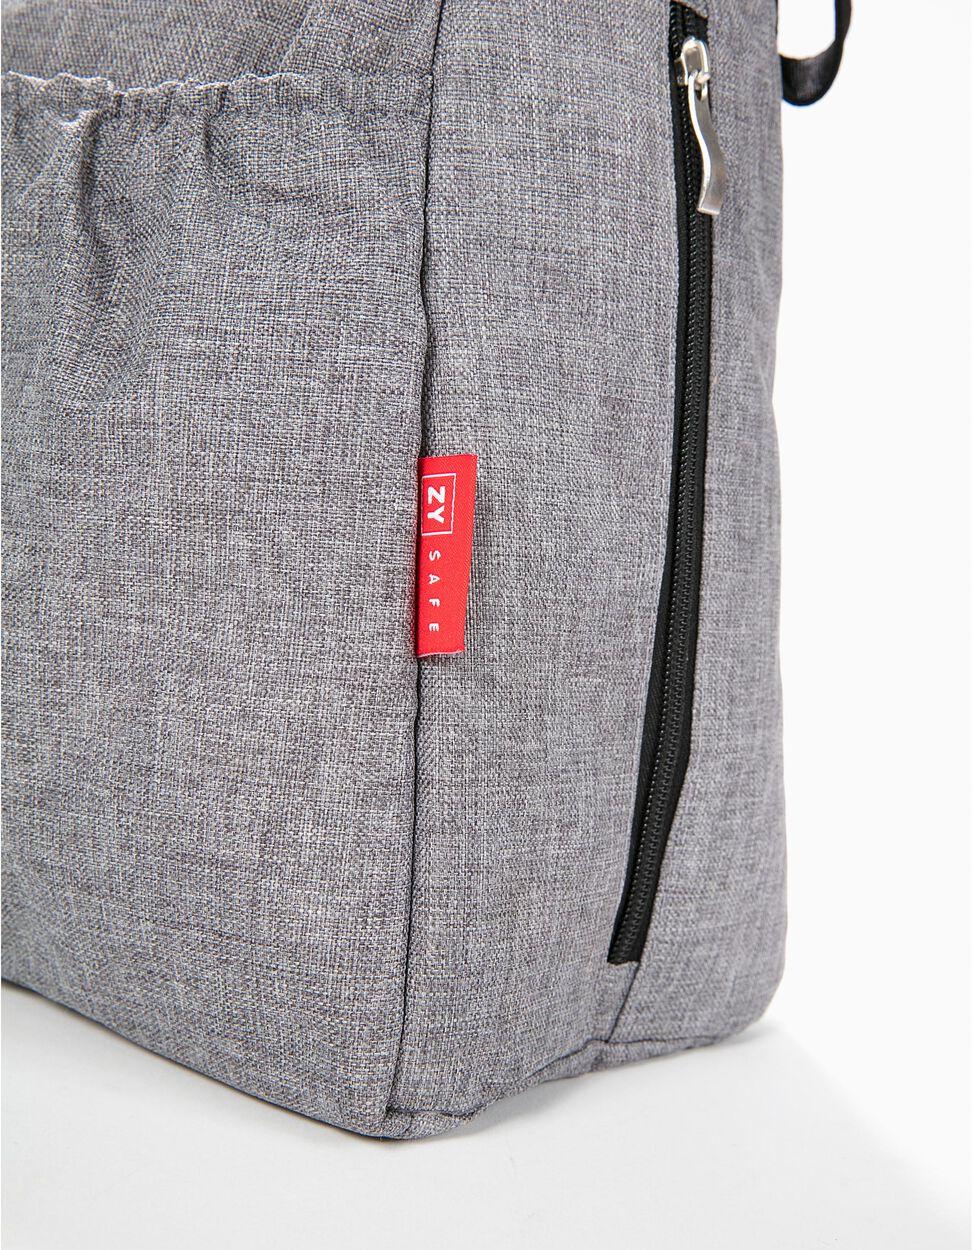 Bolso de Pañales 30x40x15 cm Simple Zy Safe